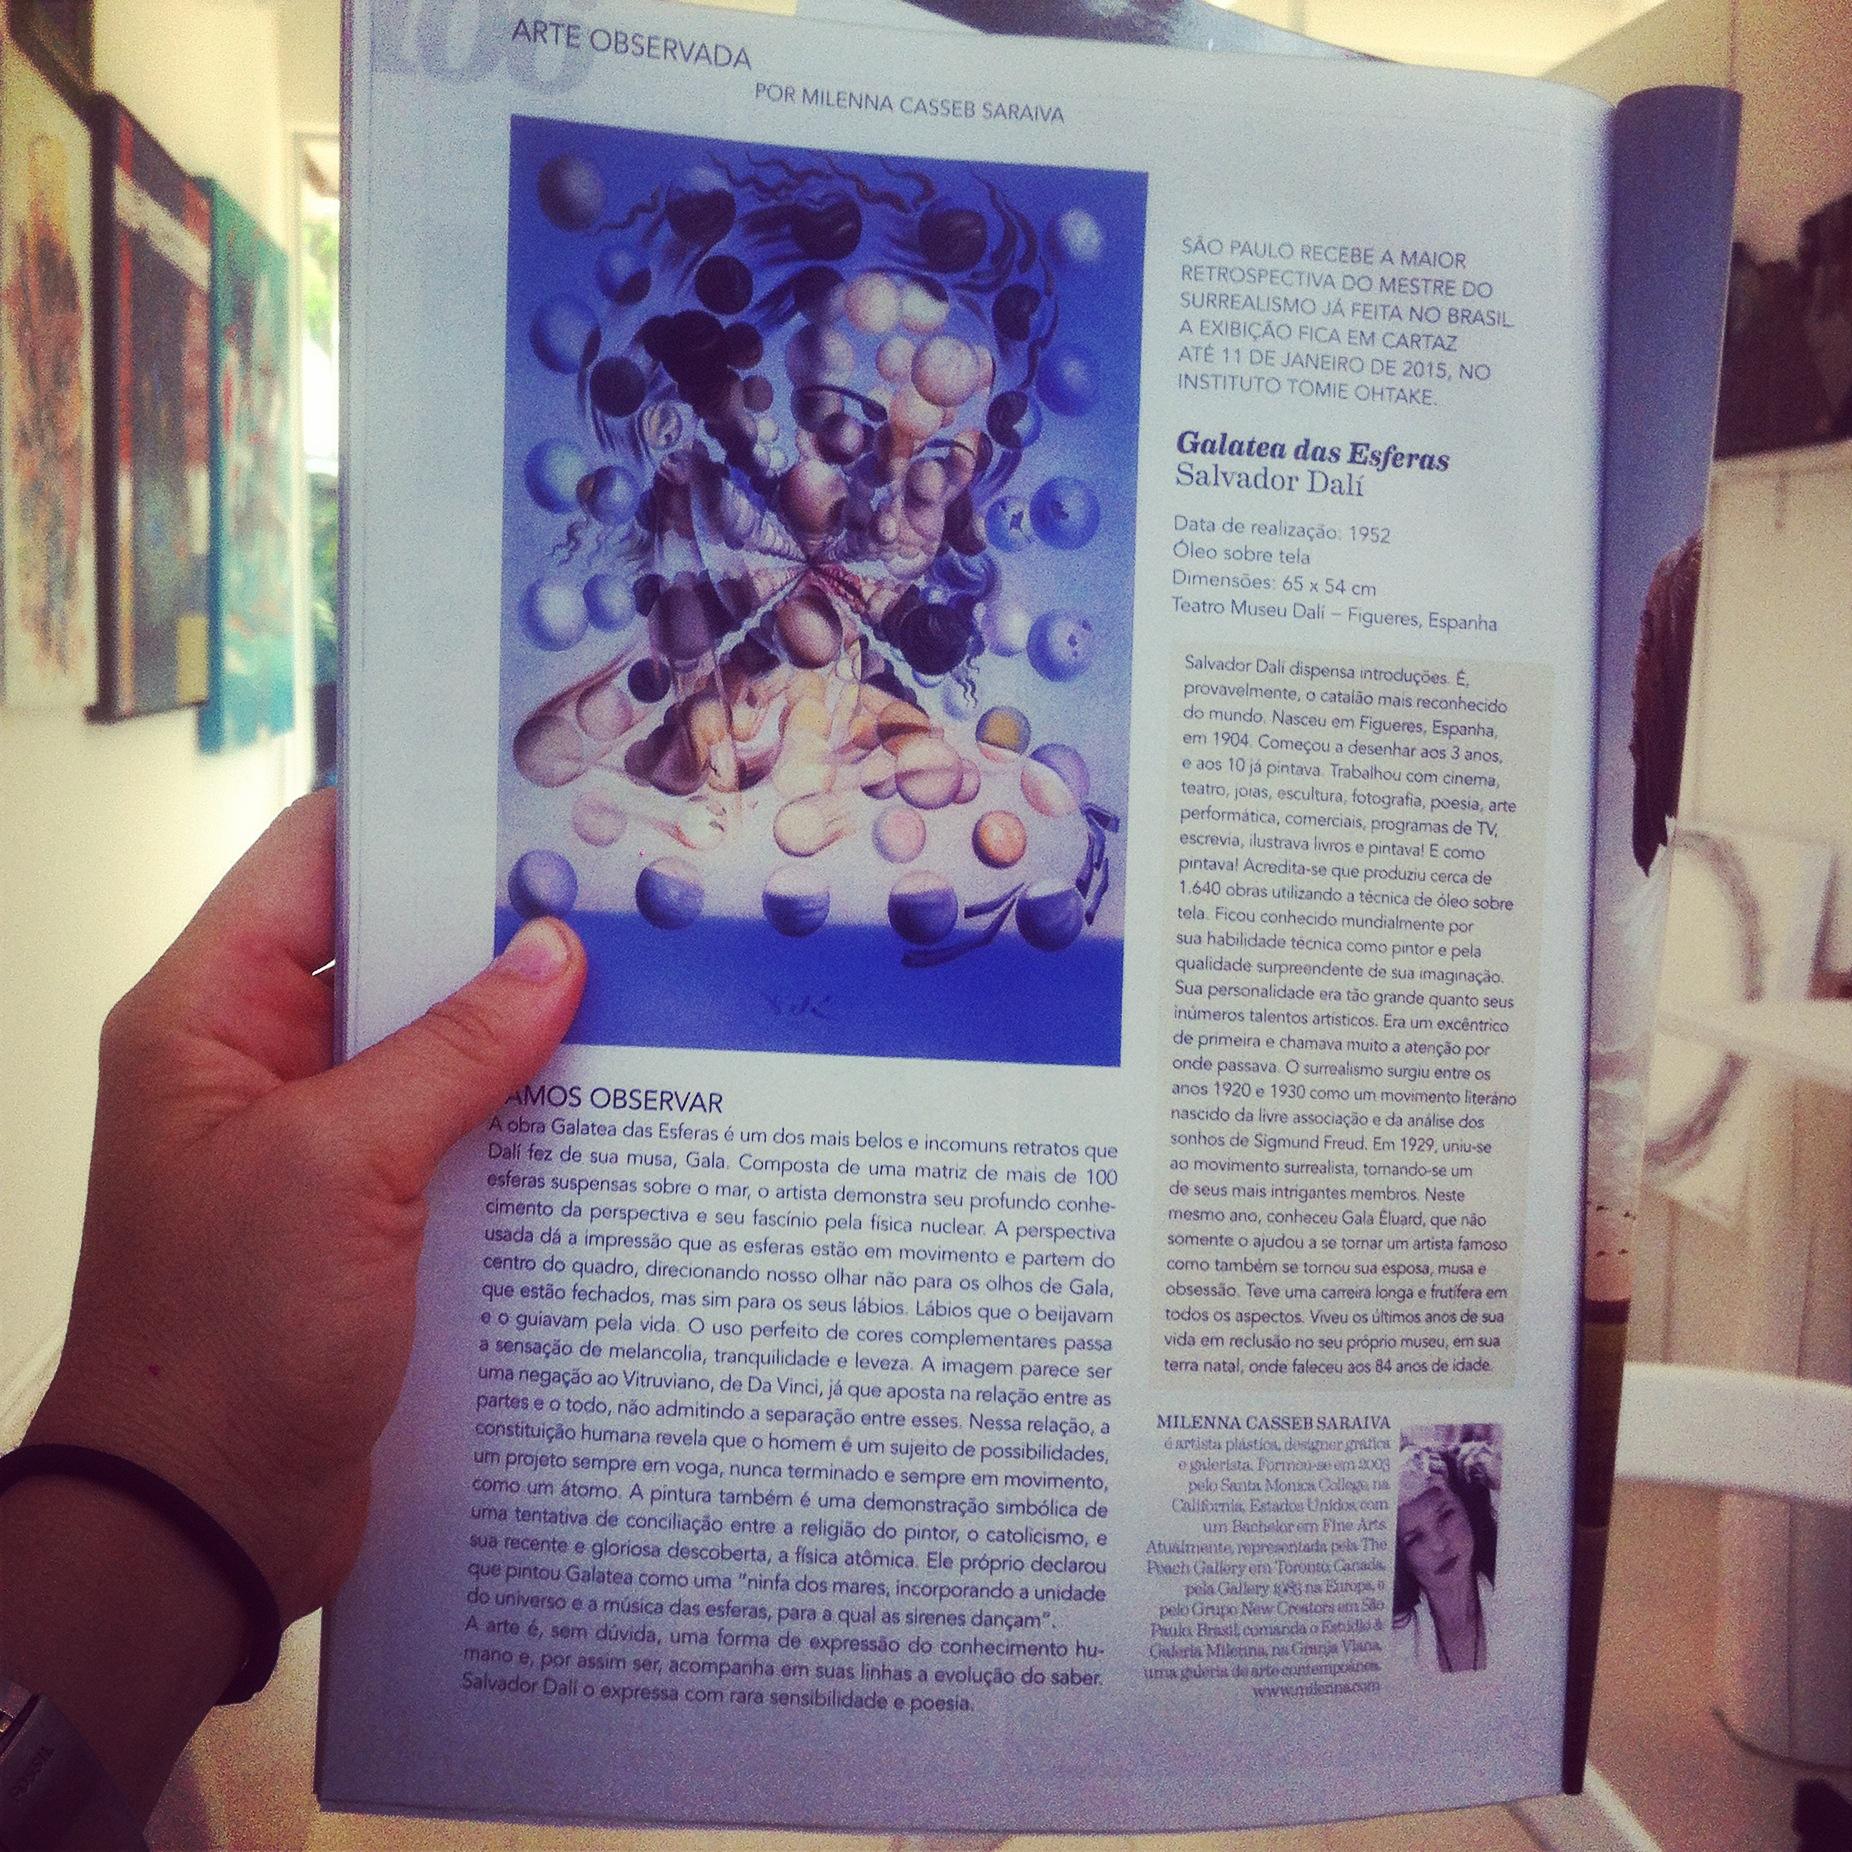 Coluna Arte Observada - 11/2014